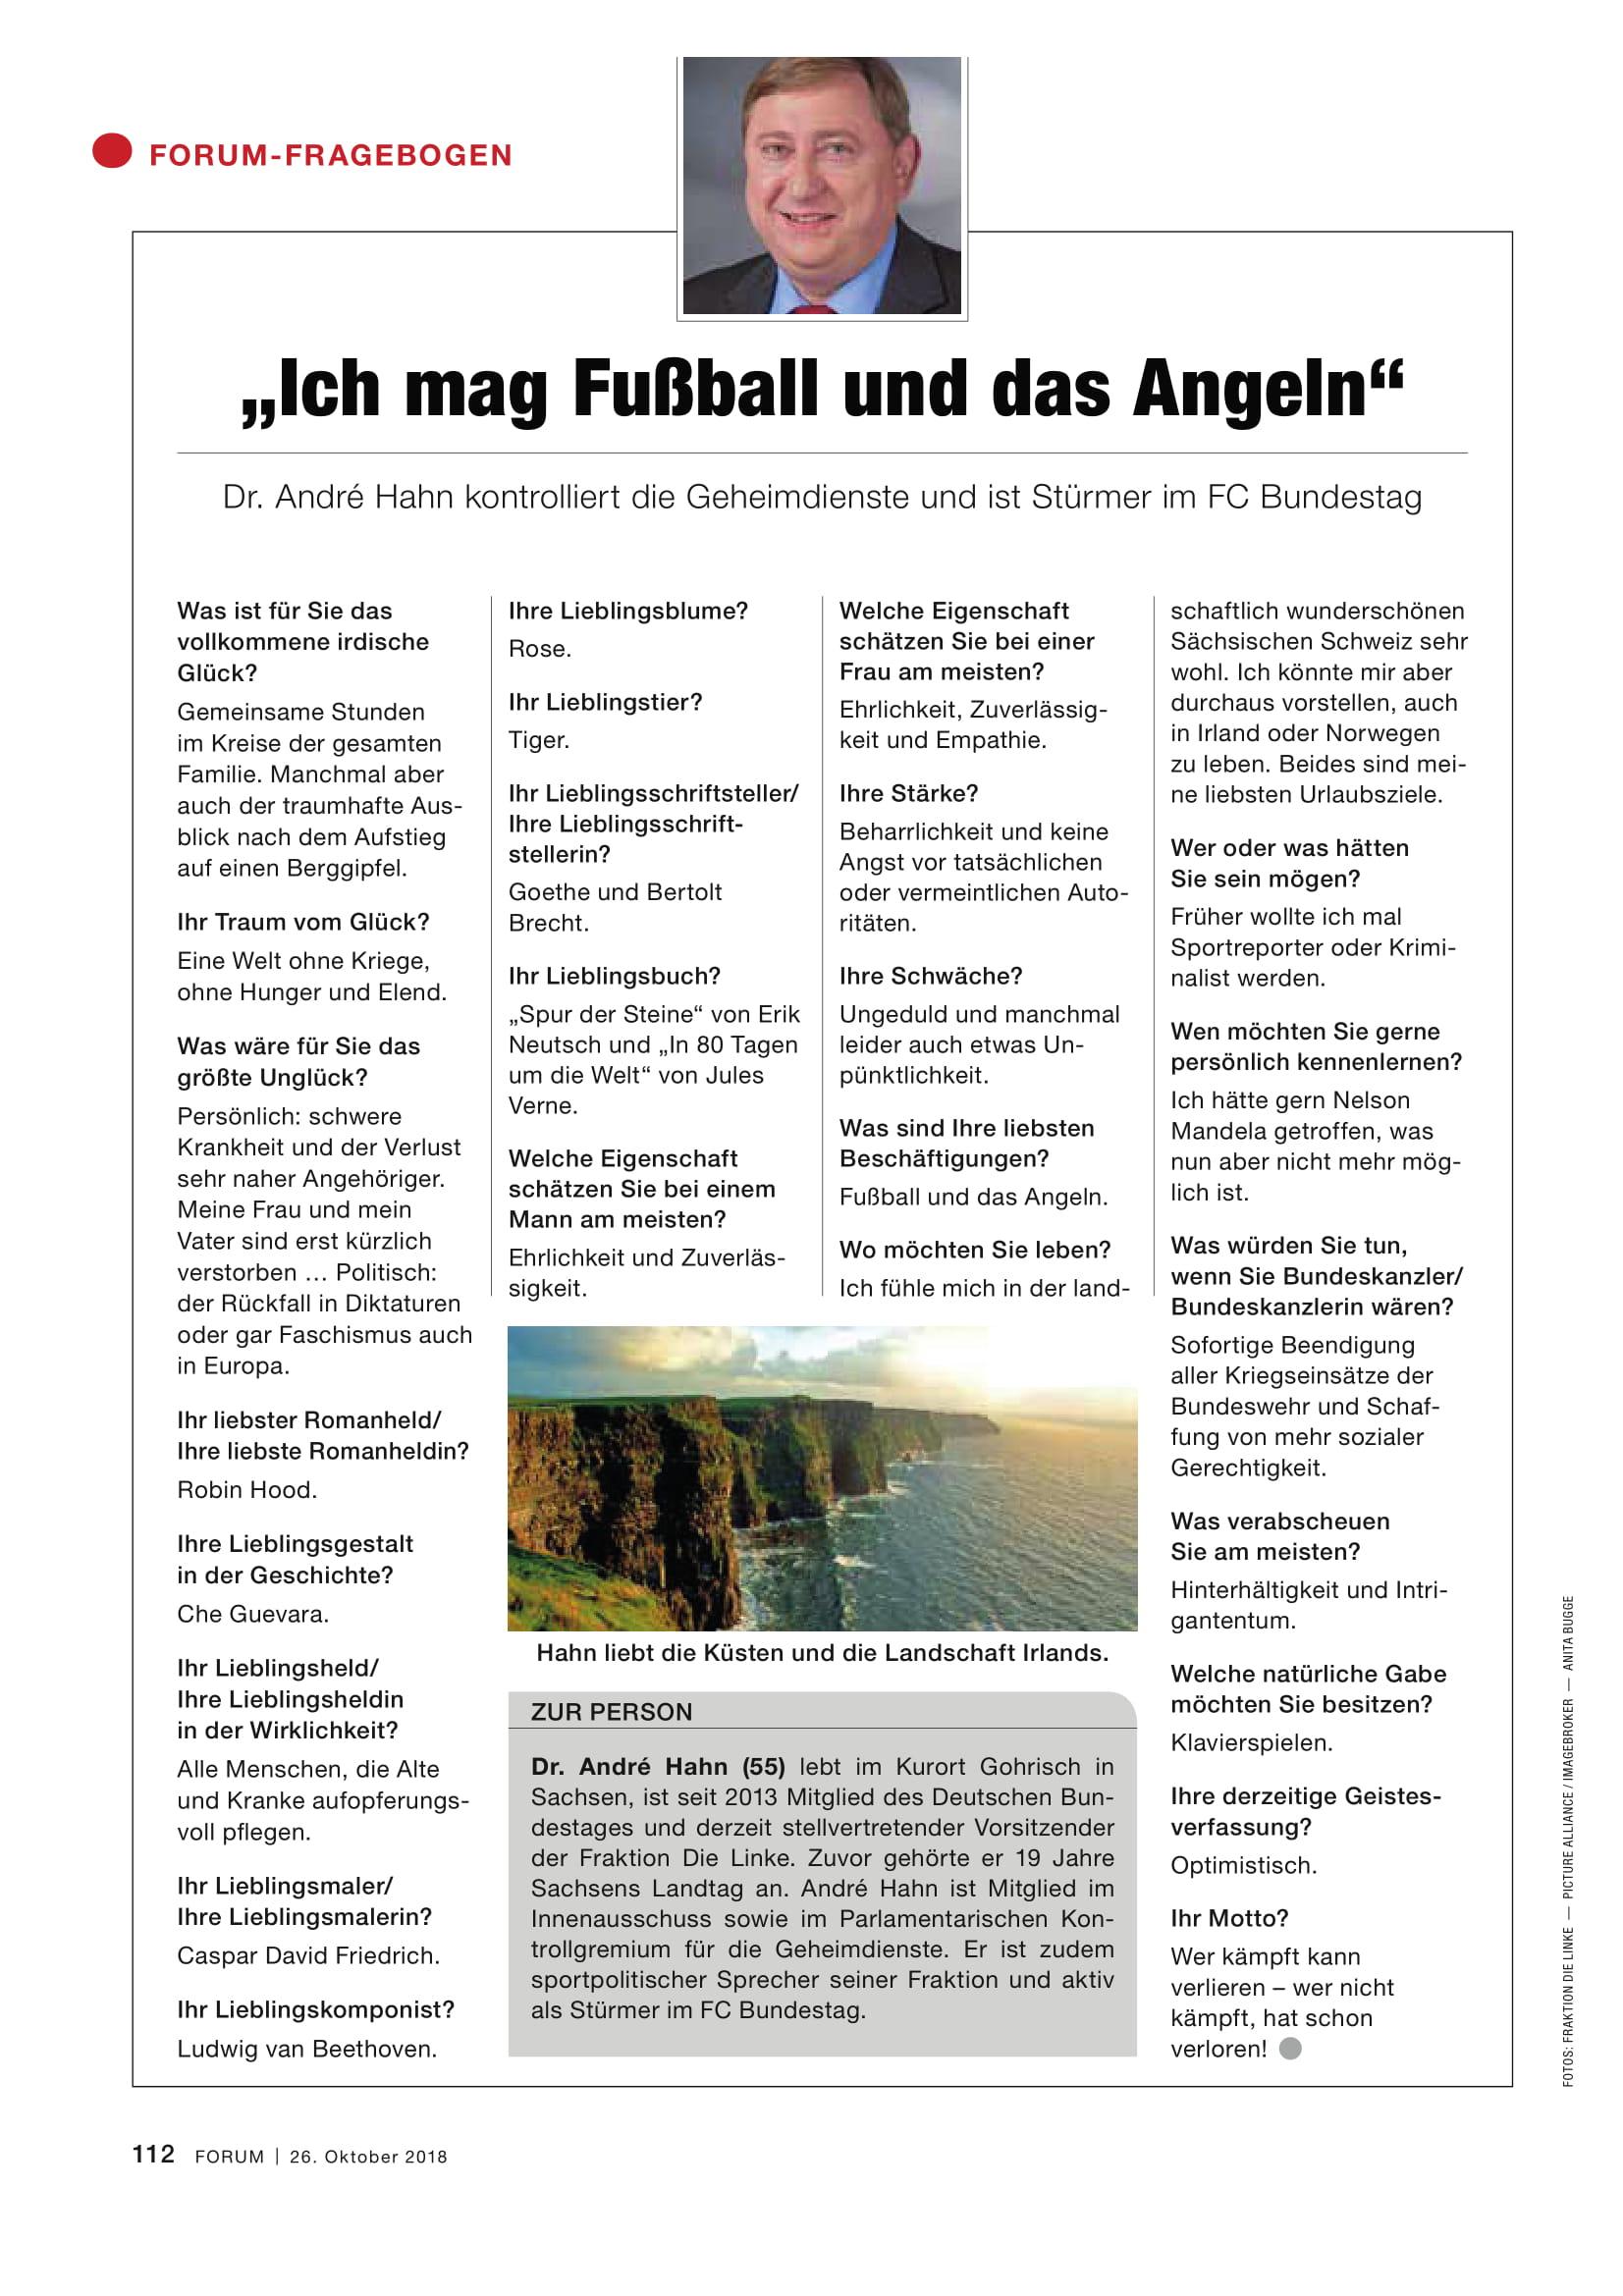 ausgabe-2018-44-be_andrehahn-1